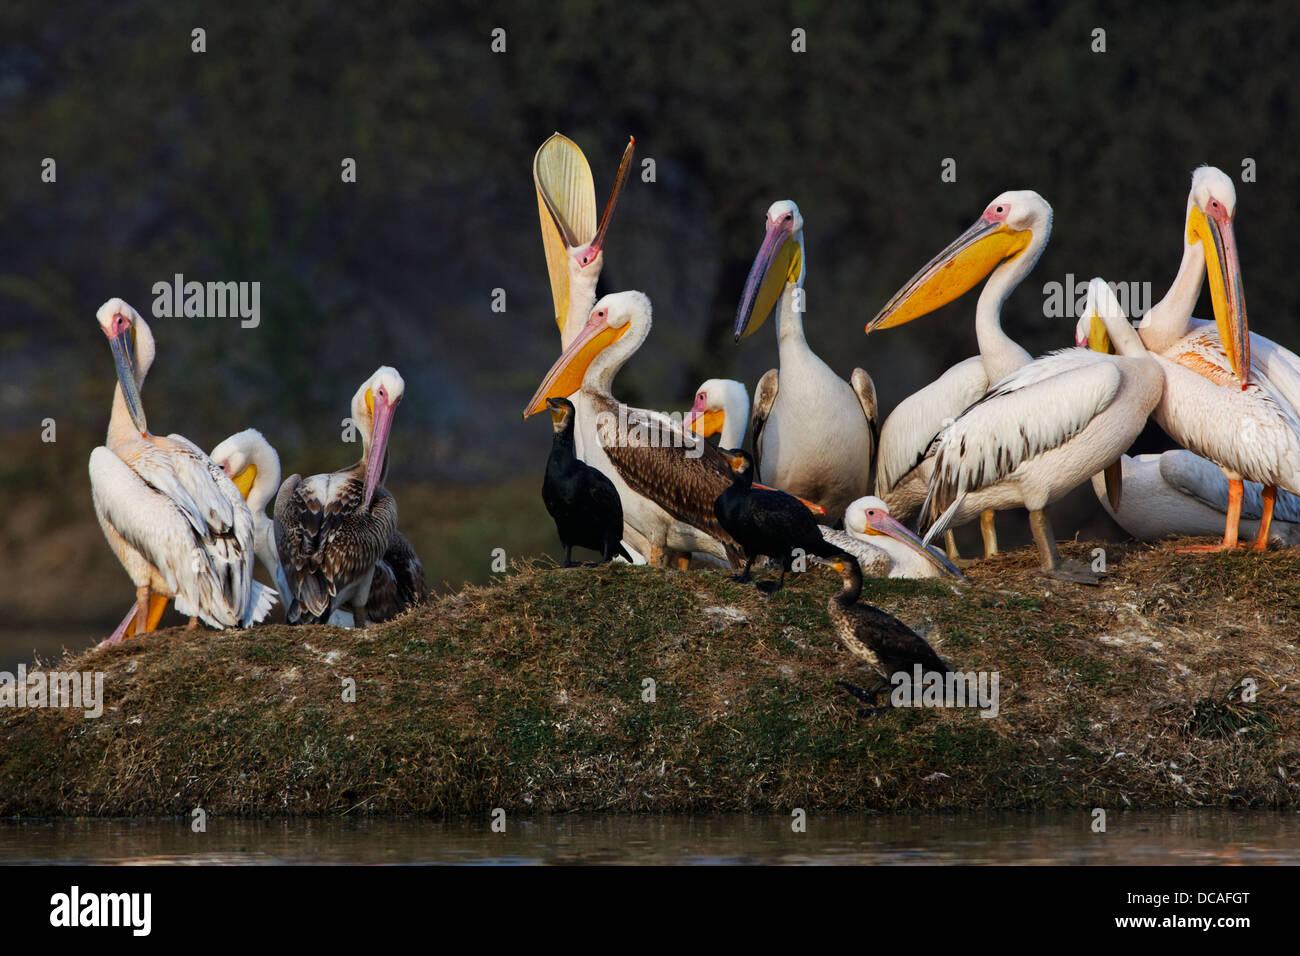 Große weiße Pelikane (Pelecanus Onocrotalus) Indien. Stockbild